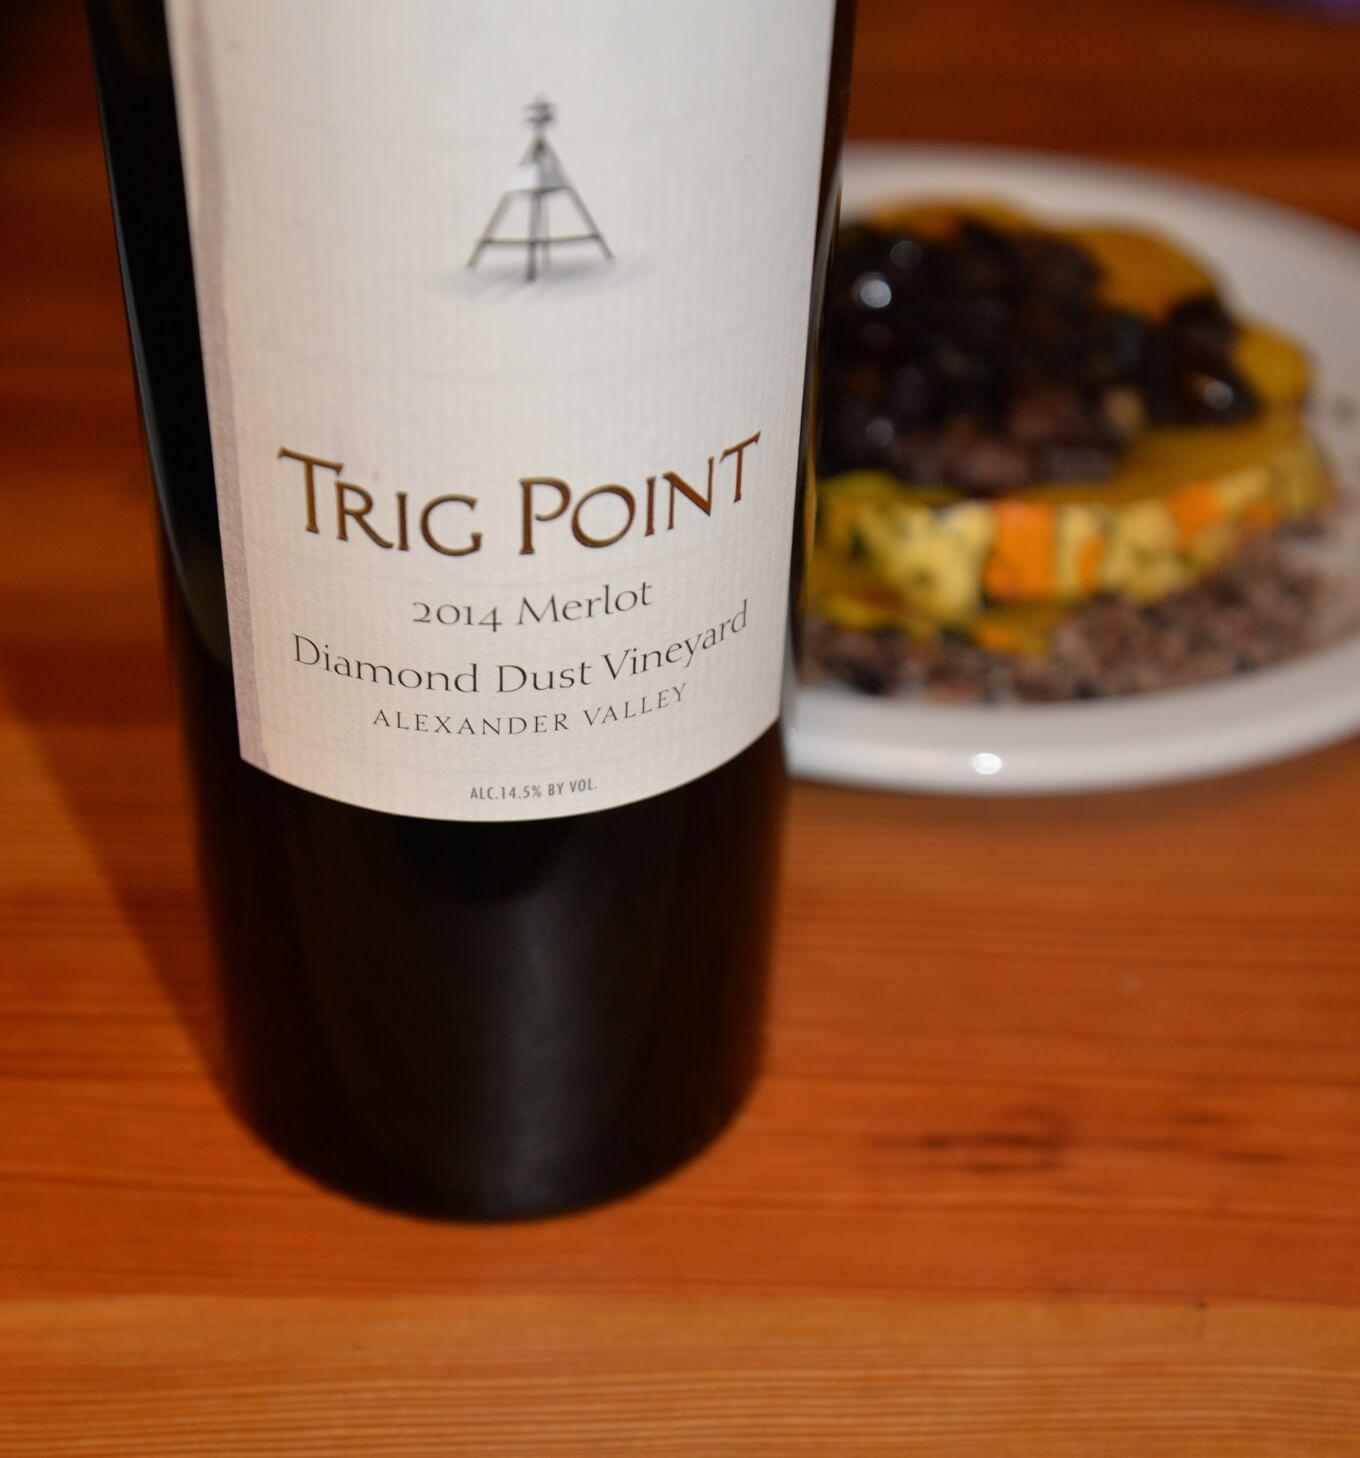 Trig Point 2014 Merlot